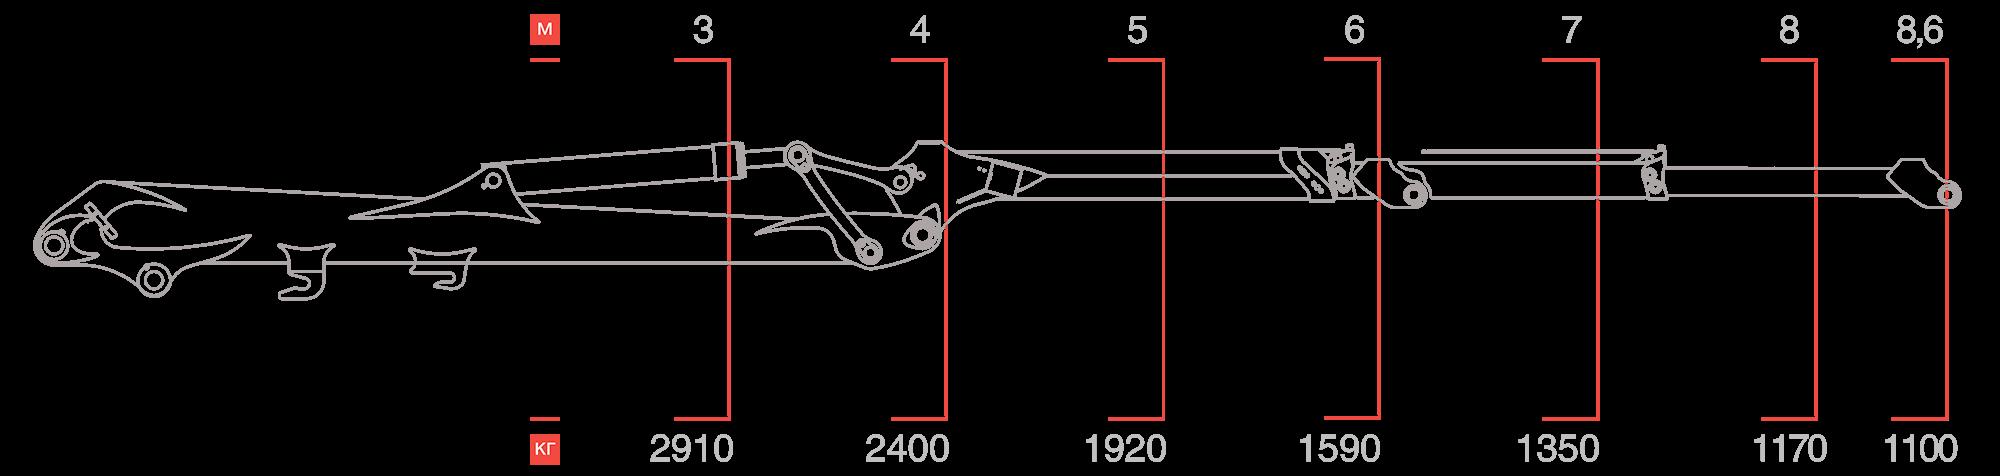 Схема грузоподъемности VM10L86